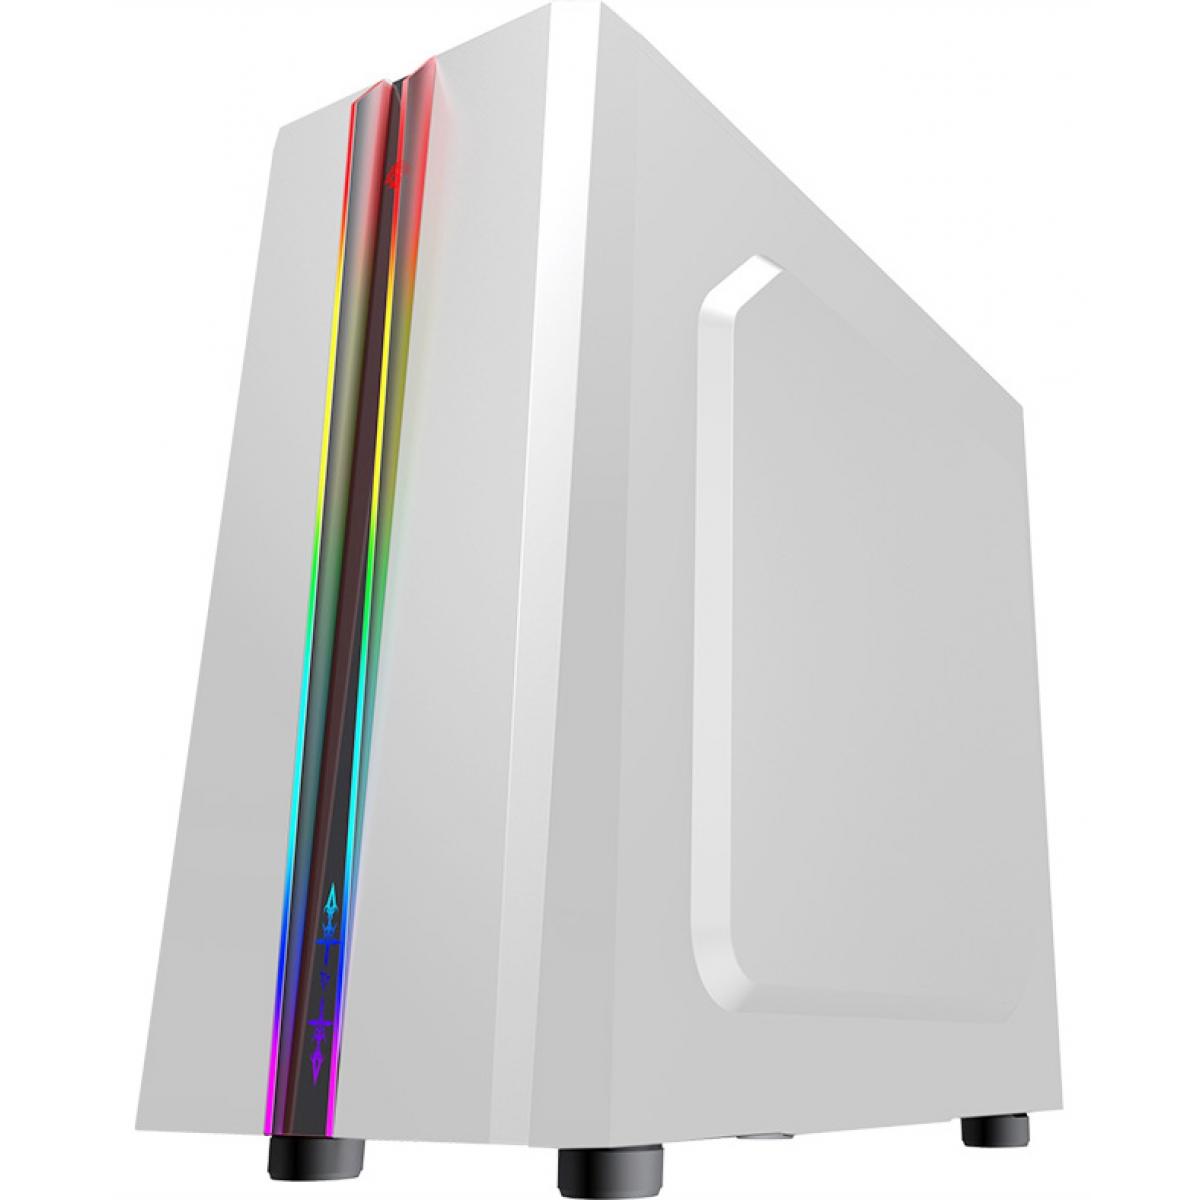 Gabinete Gamer K-mex Odyssey RGB, Mid Tower, Lateral de Acrílico, White, S-Fonte, CG-05RD